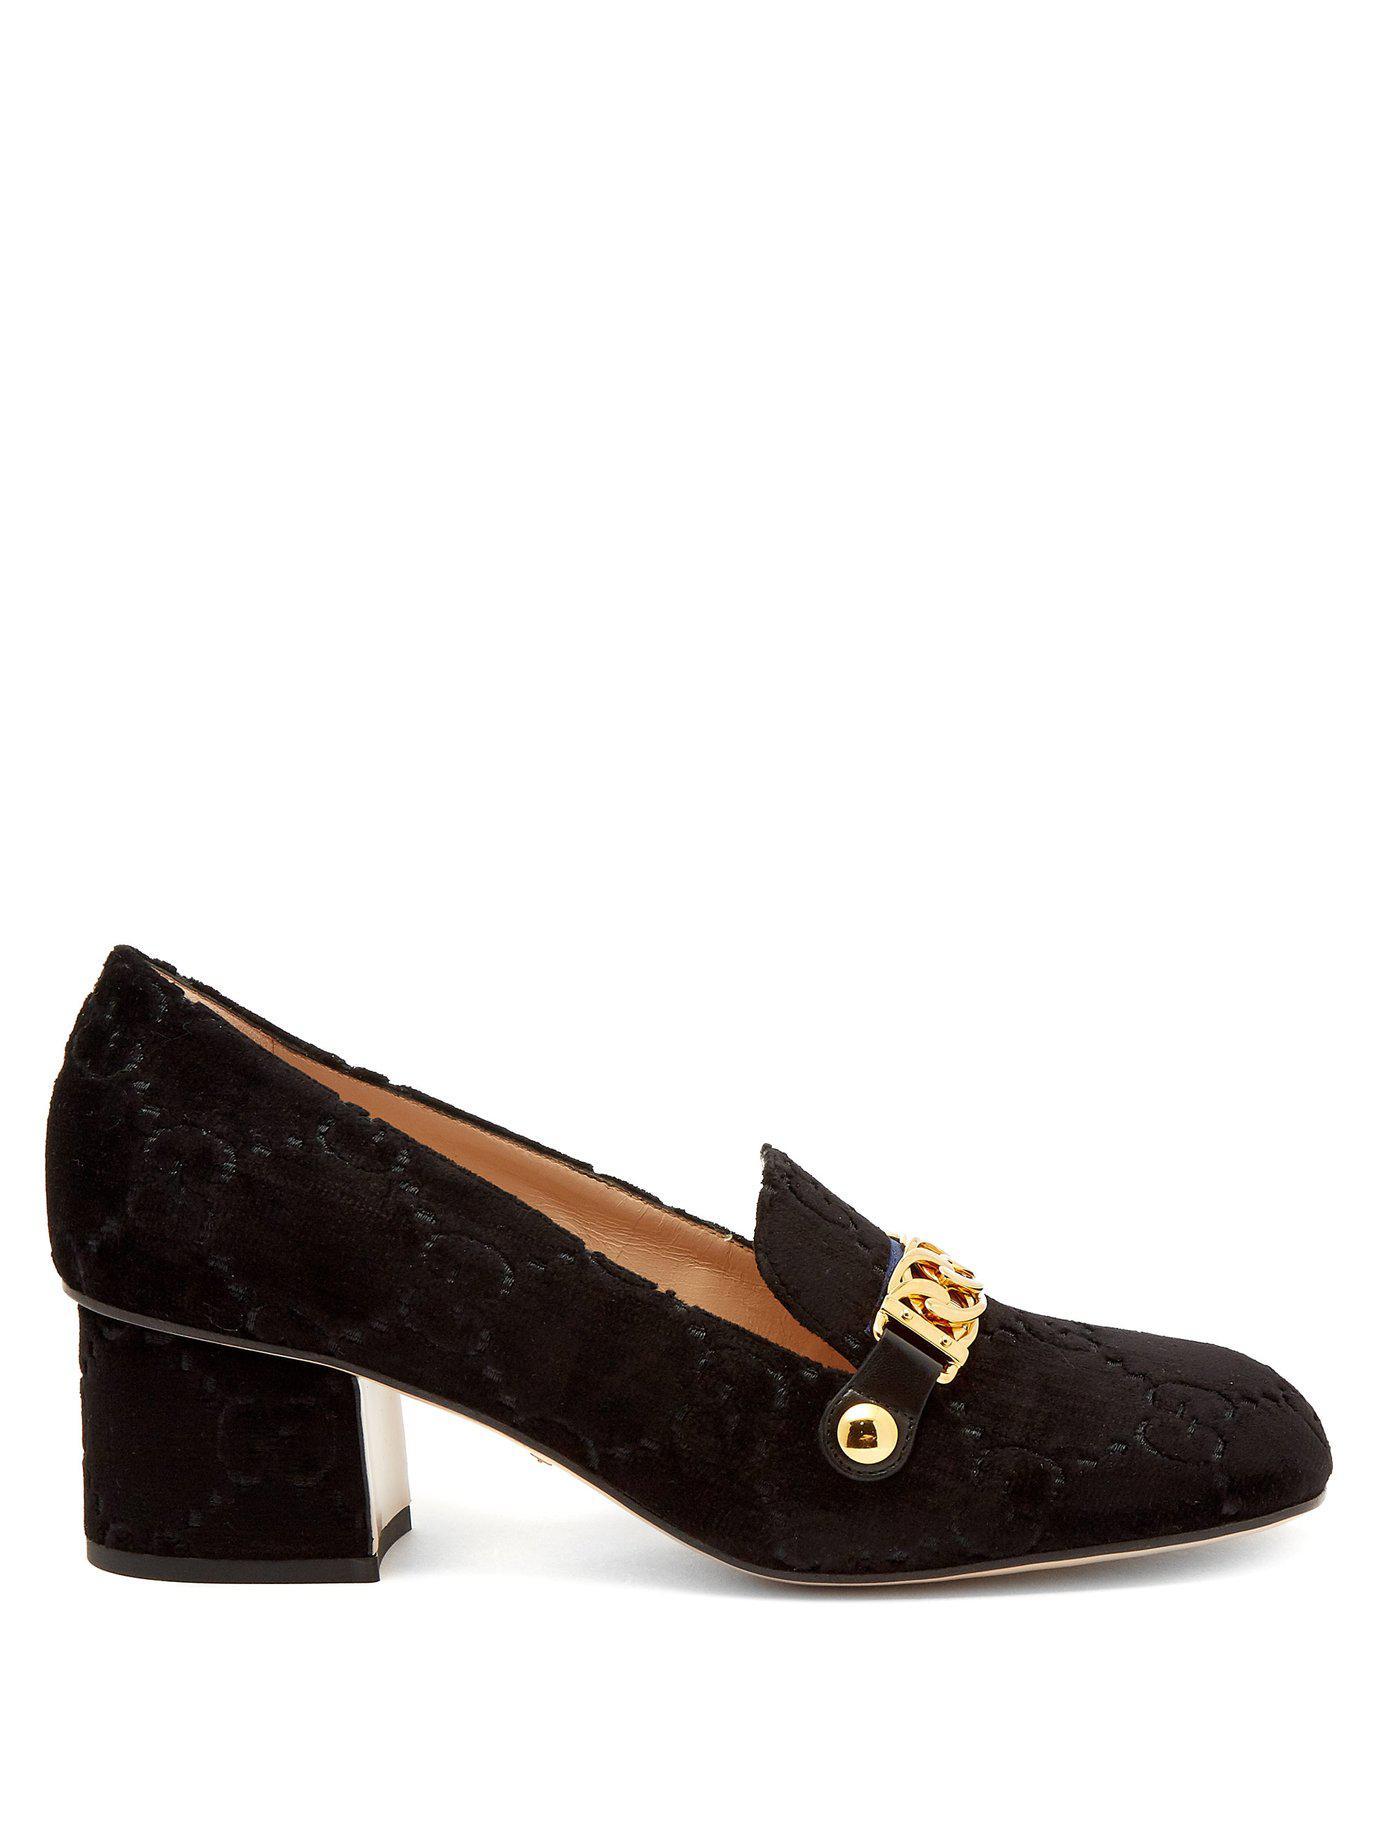 6c522212913 Lyst - Gucci Sylvie Logo Debossed Velvet Loafers in Black